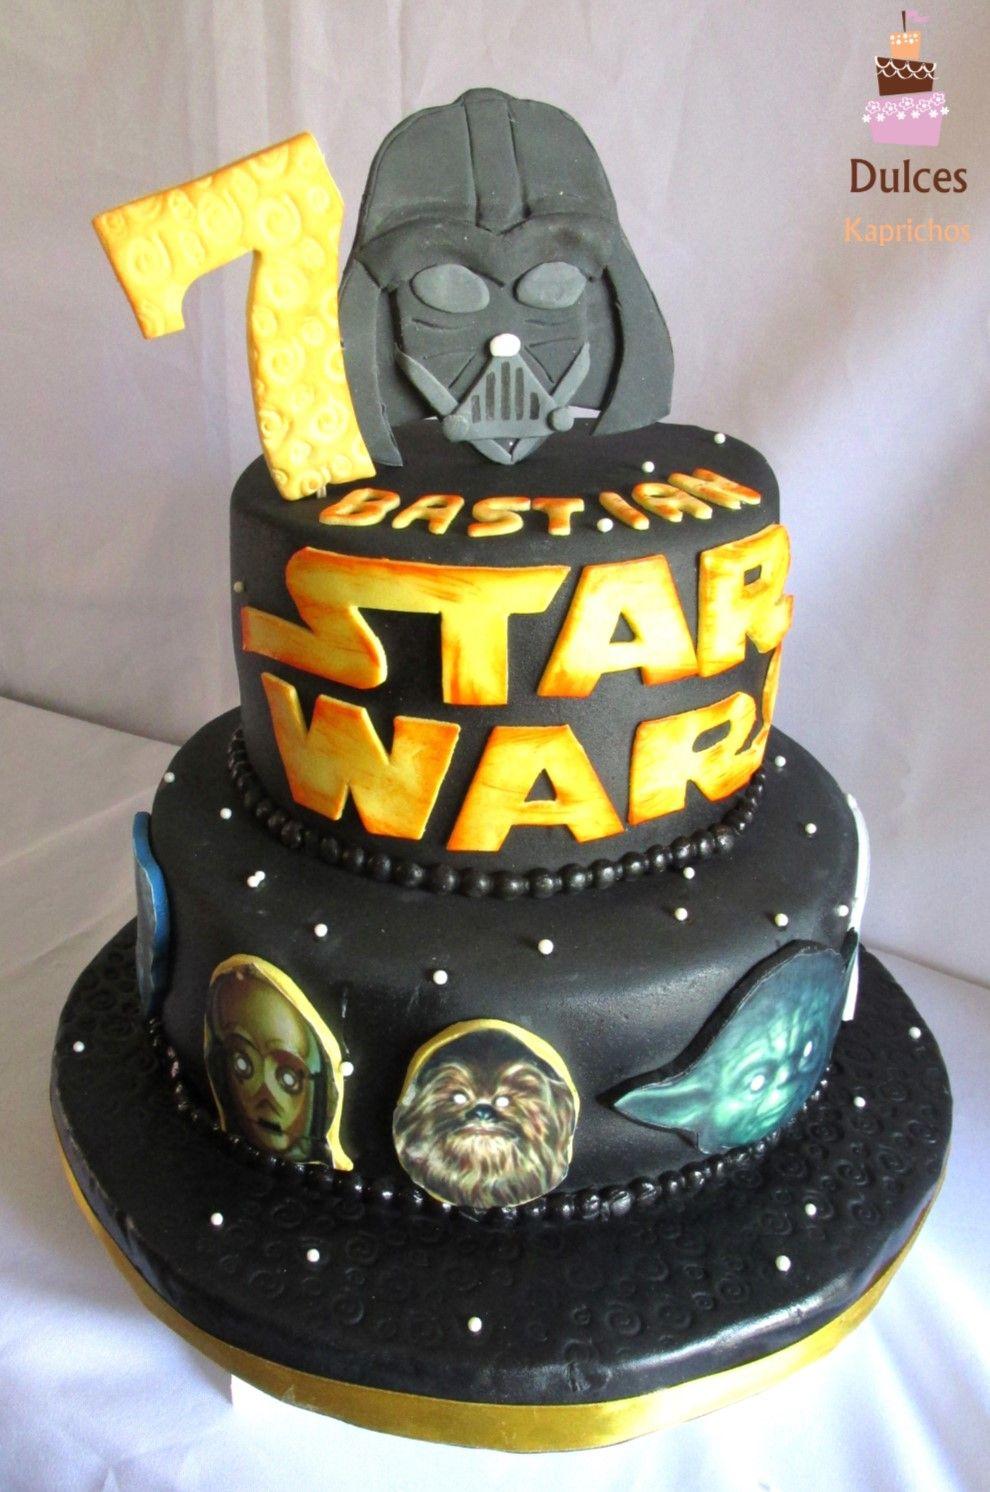 Preferenza Torta Star Wars #TortaStarWars #TortasDecoradas #DulcesKaprichos  BM35